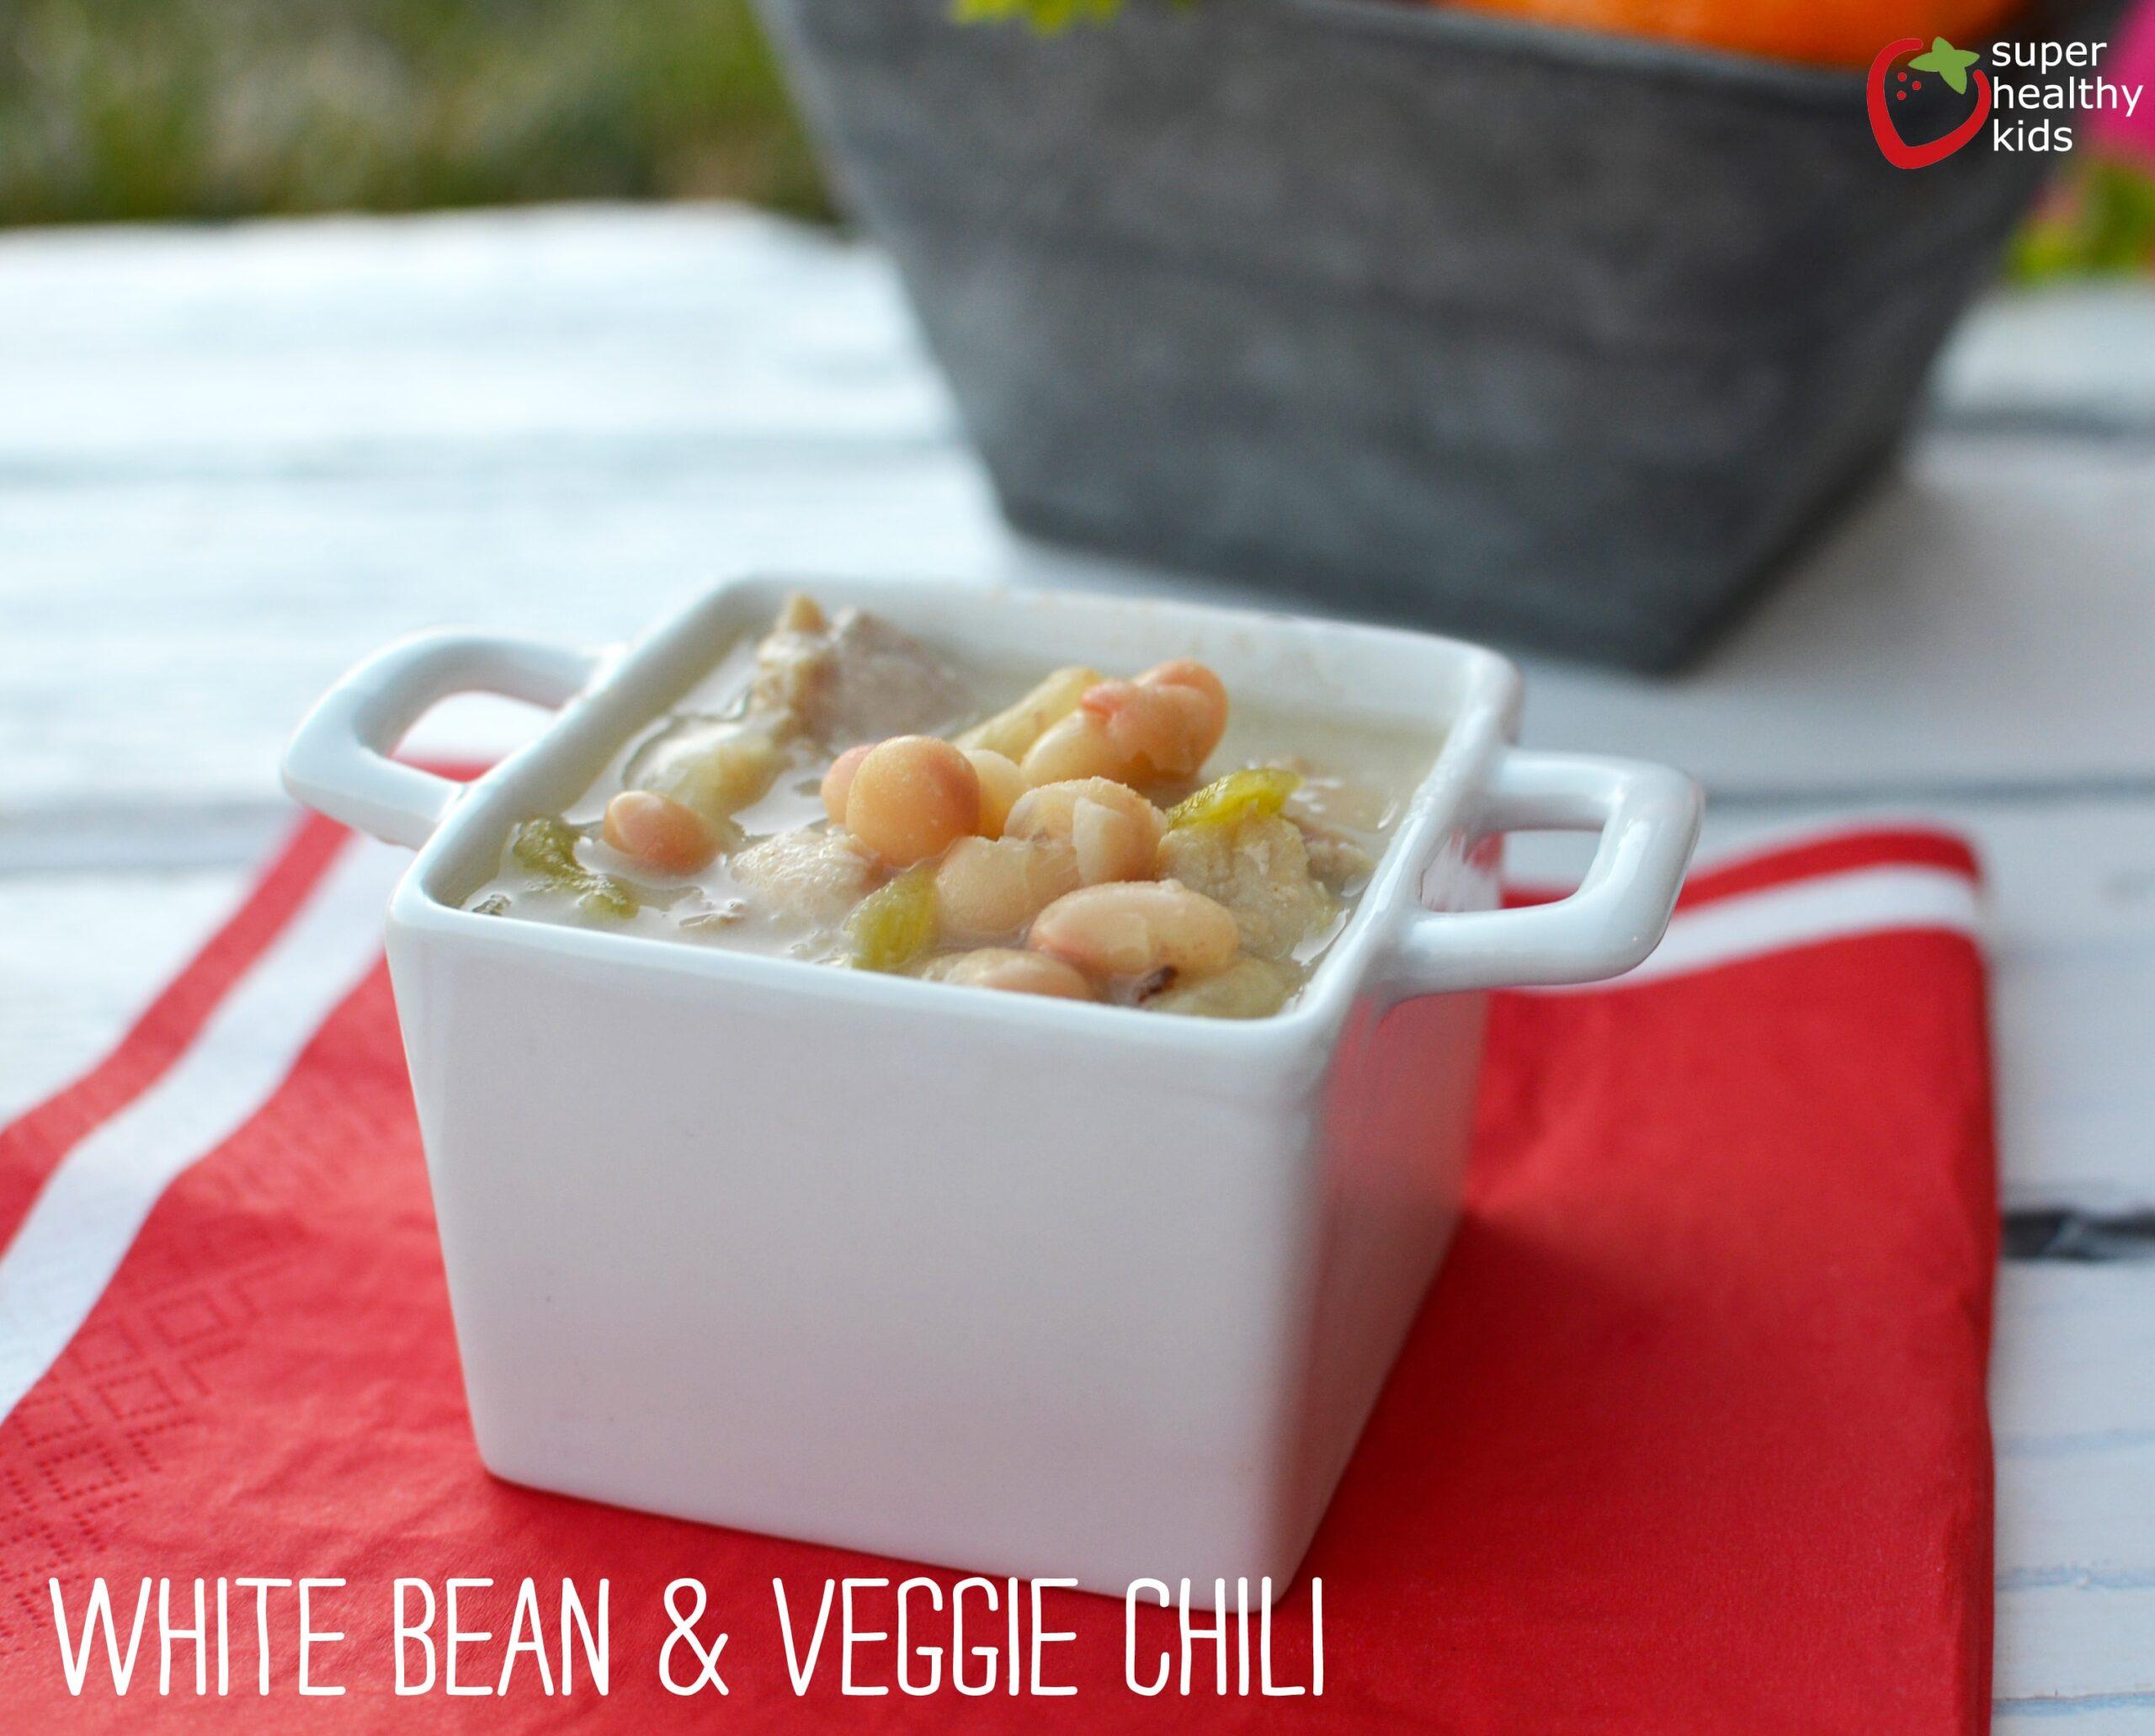 White Bean One Pot Chili Recipe Healthy Ideas For Kids